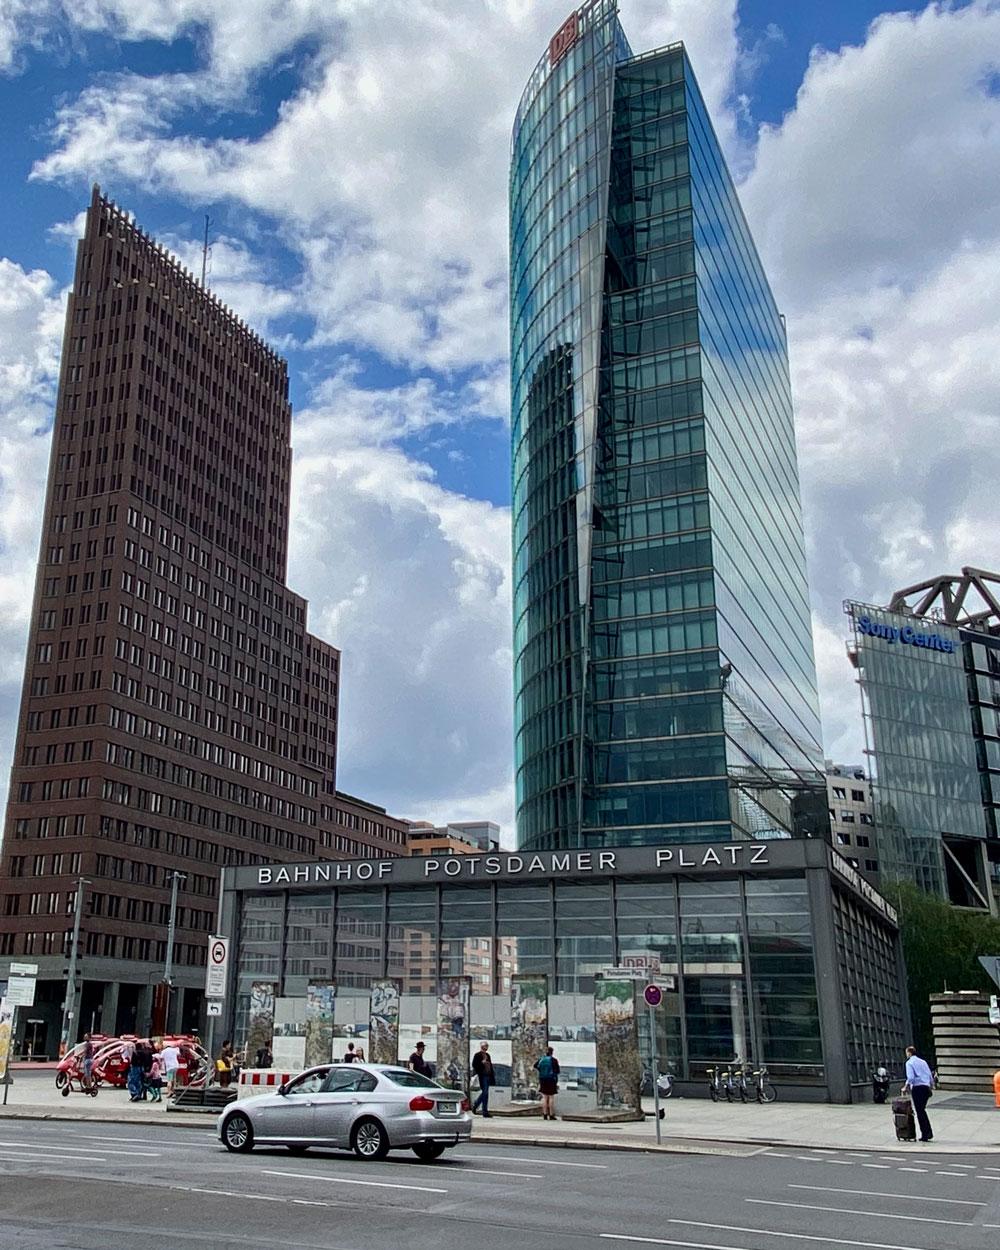 m_Berlin-potsdamerplatz-Immobilien